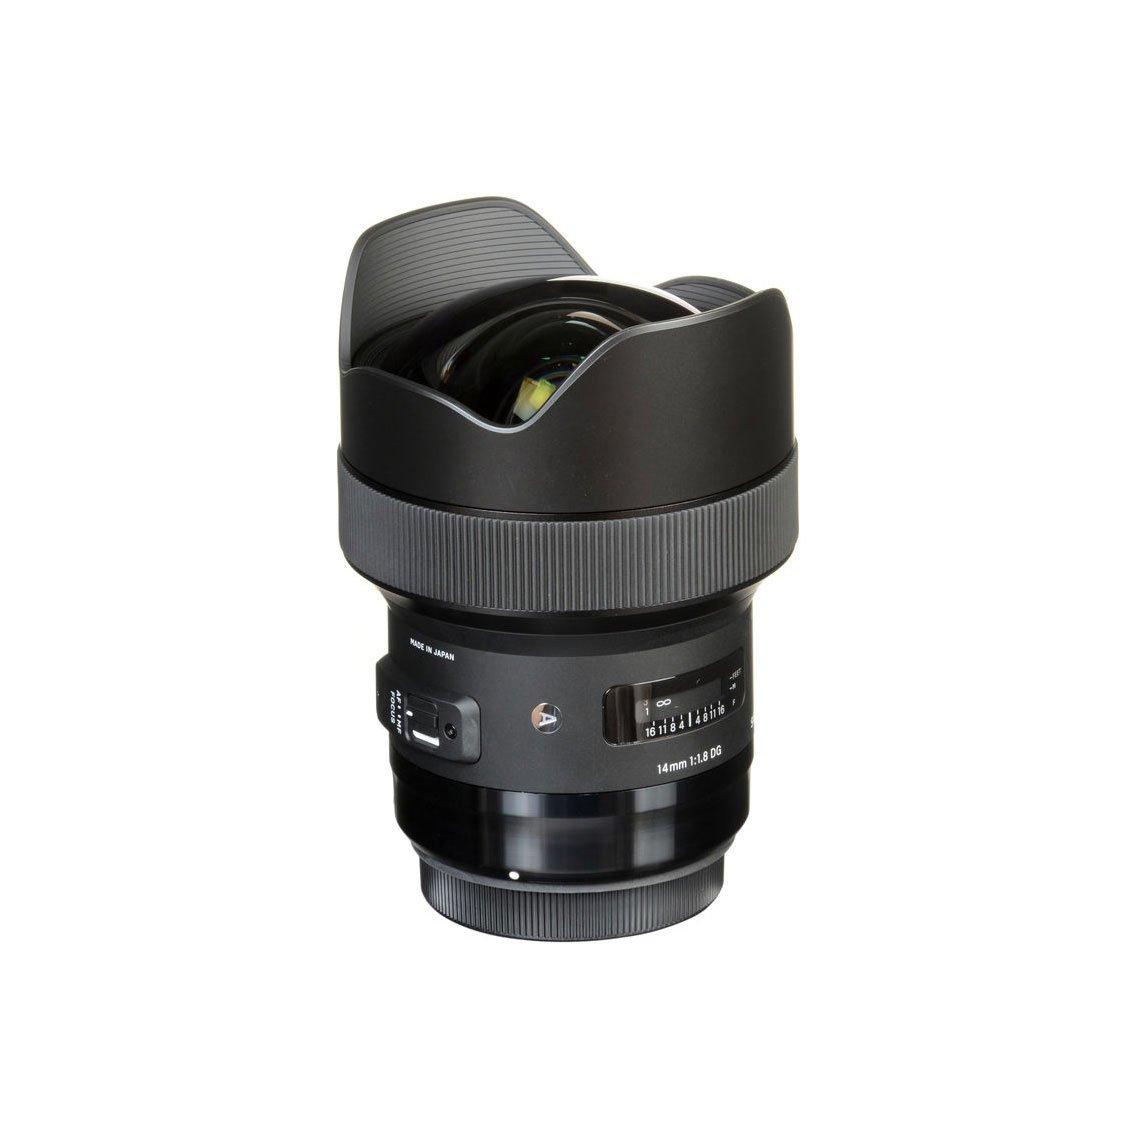 Sigma 14mm lens